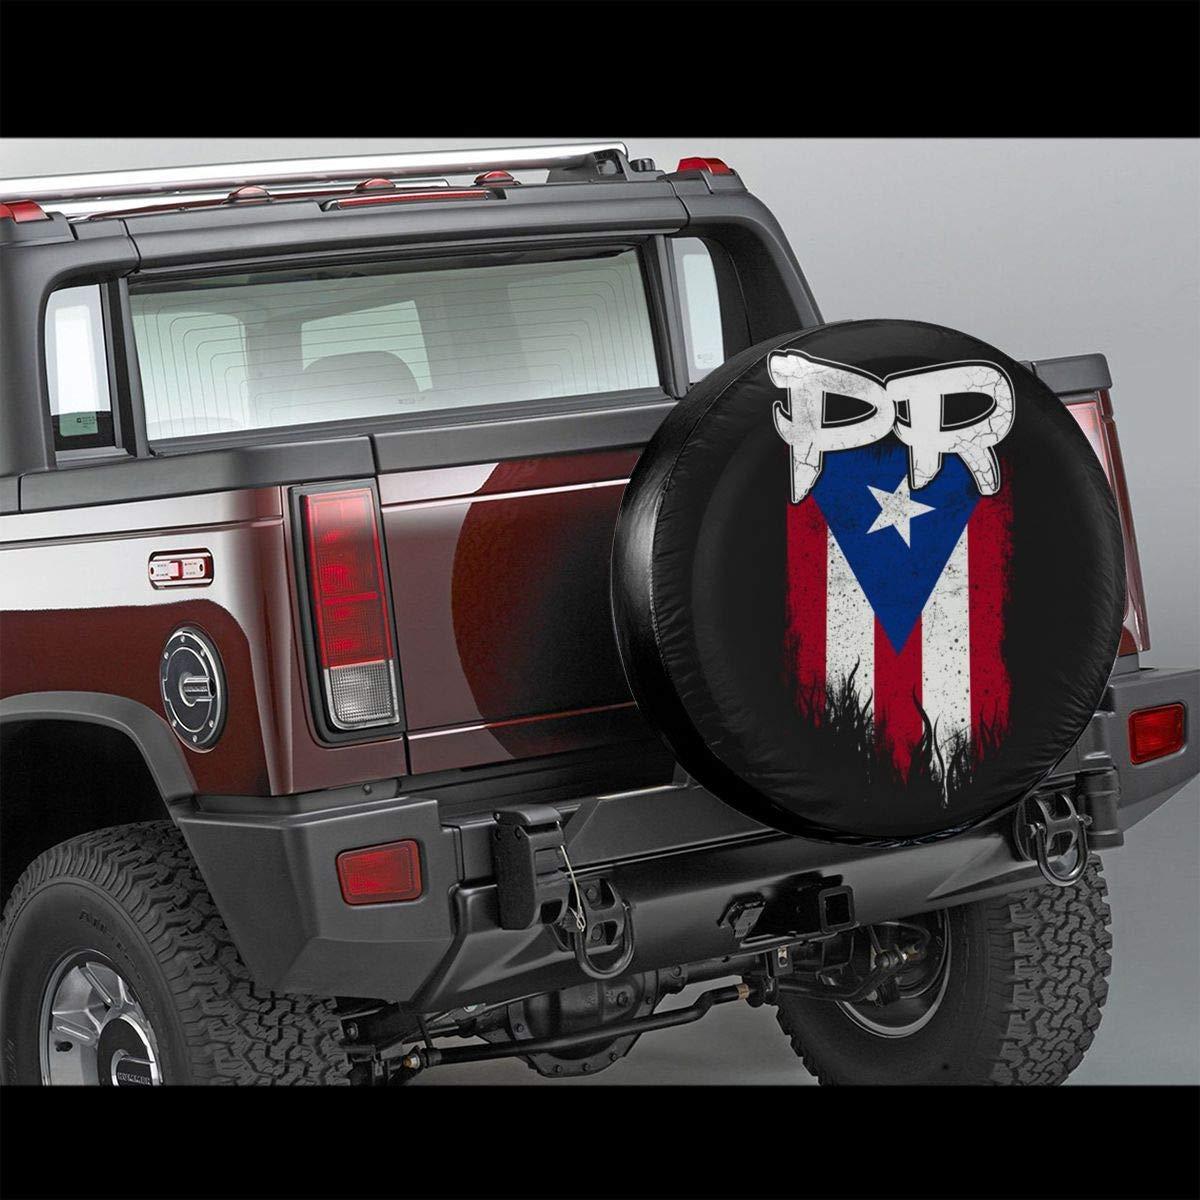 Zoe Diro Puerto Rico Pr Flag Waterproof Spare Tire Cover Fits for Jeep Trailer RV SUV Truck Camper Travel Wheel Covers Accessories